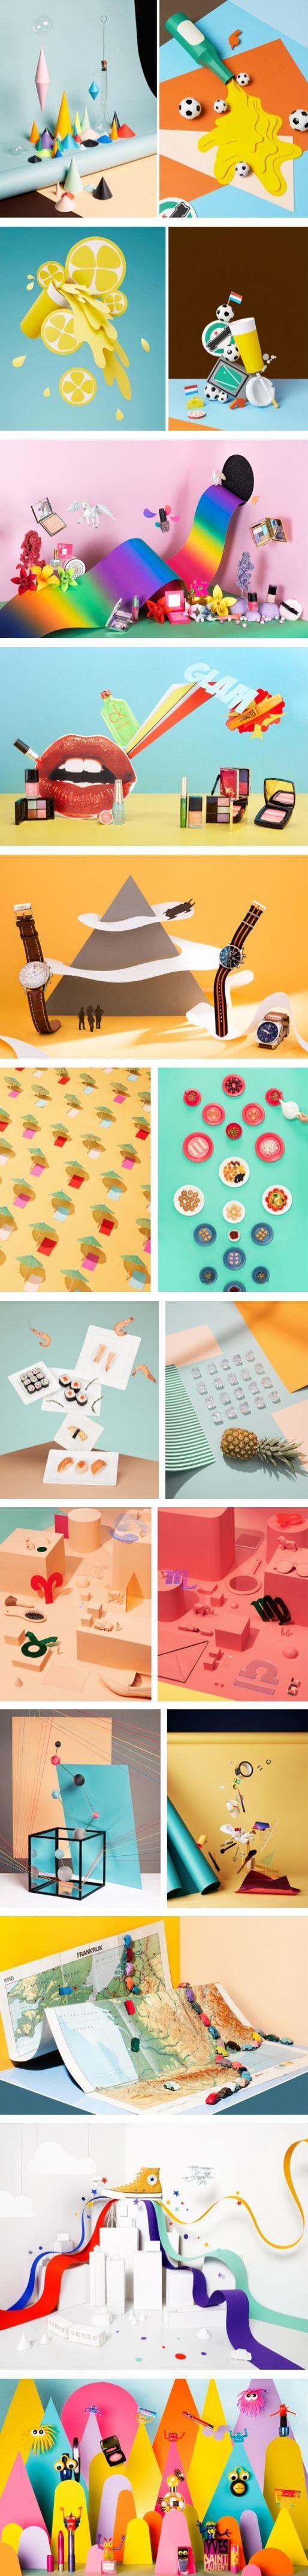 Pin de Flo H. en ▲Set design & Styling | Pinterest